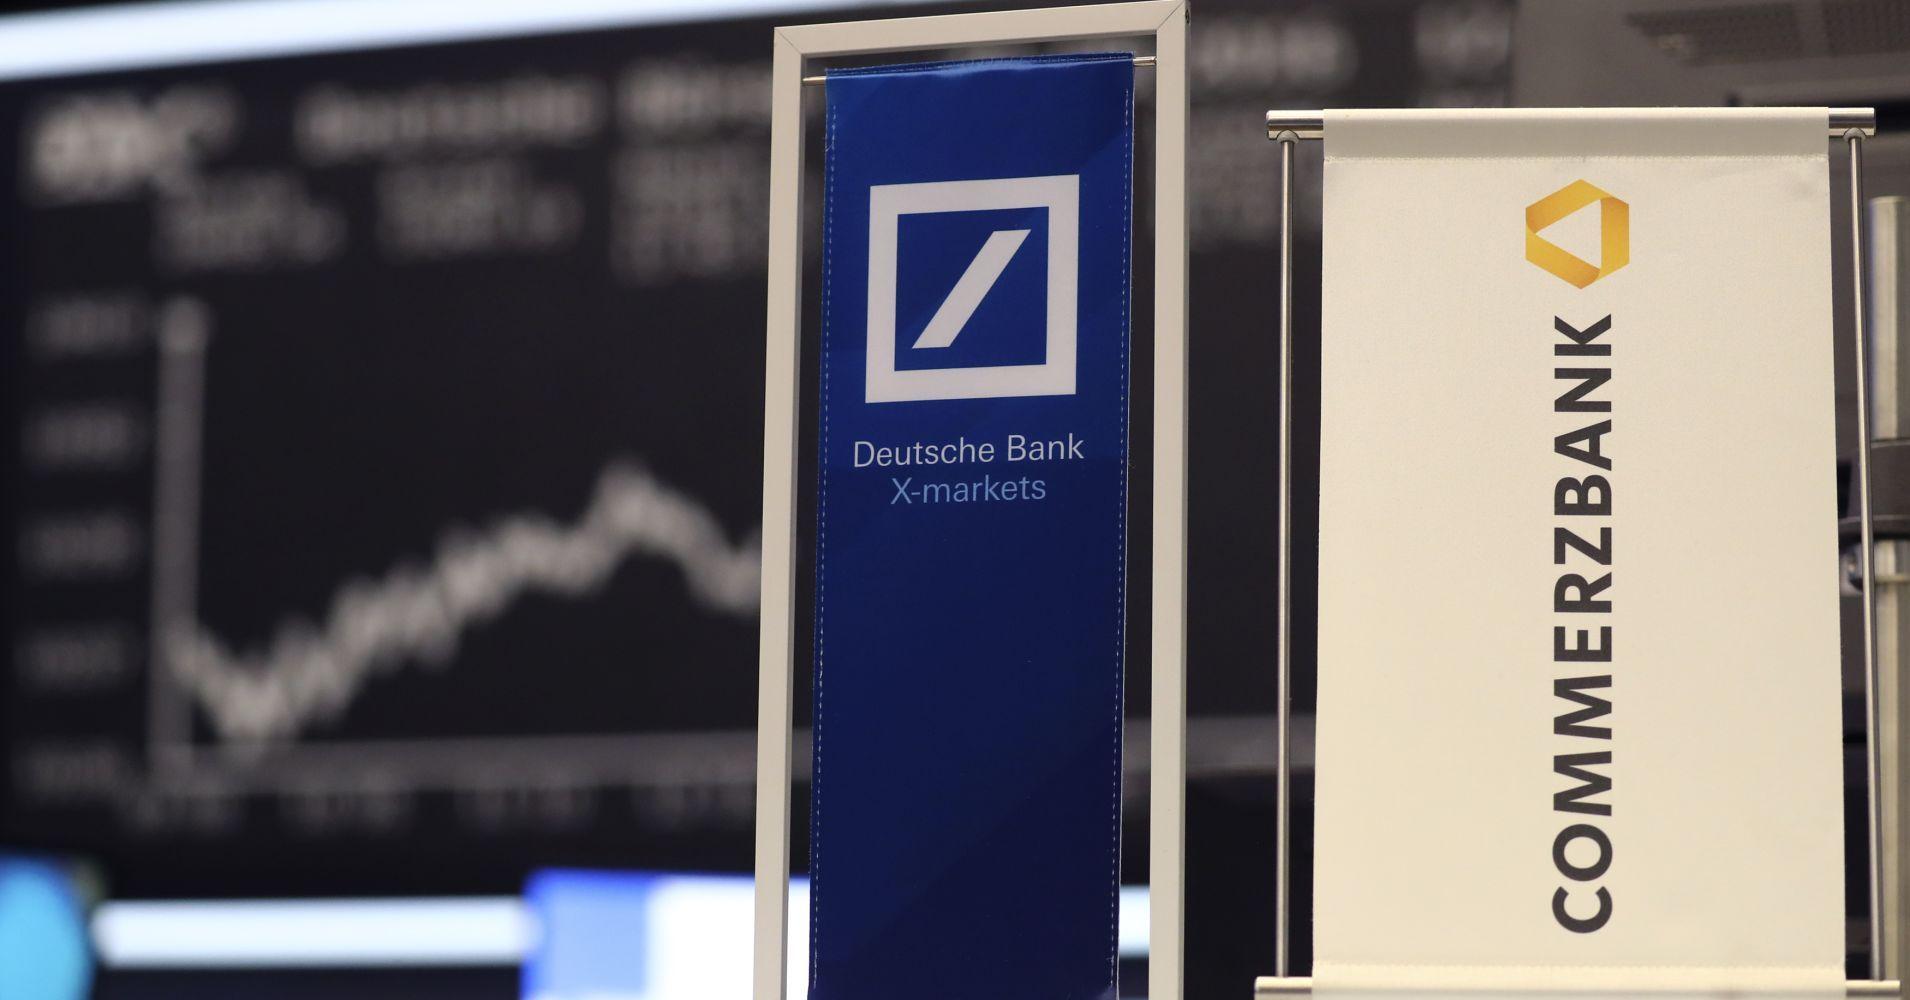 Deutsche Bank reportedly considered restructuring Trump's